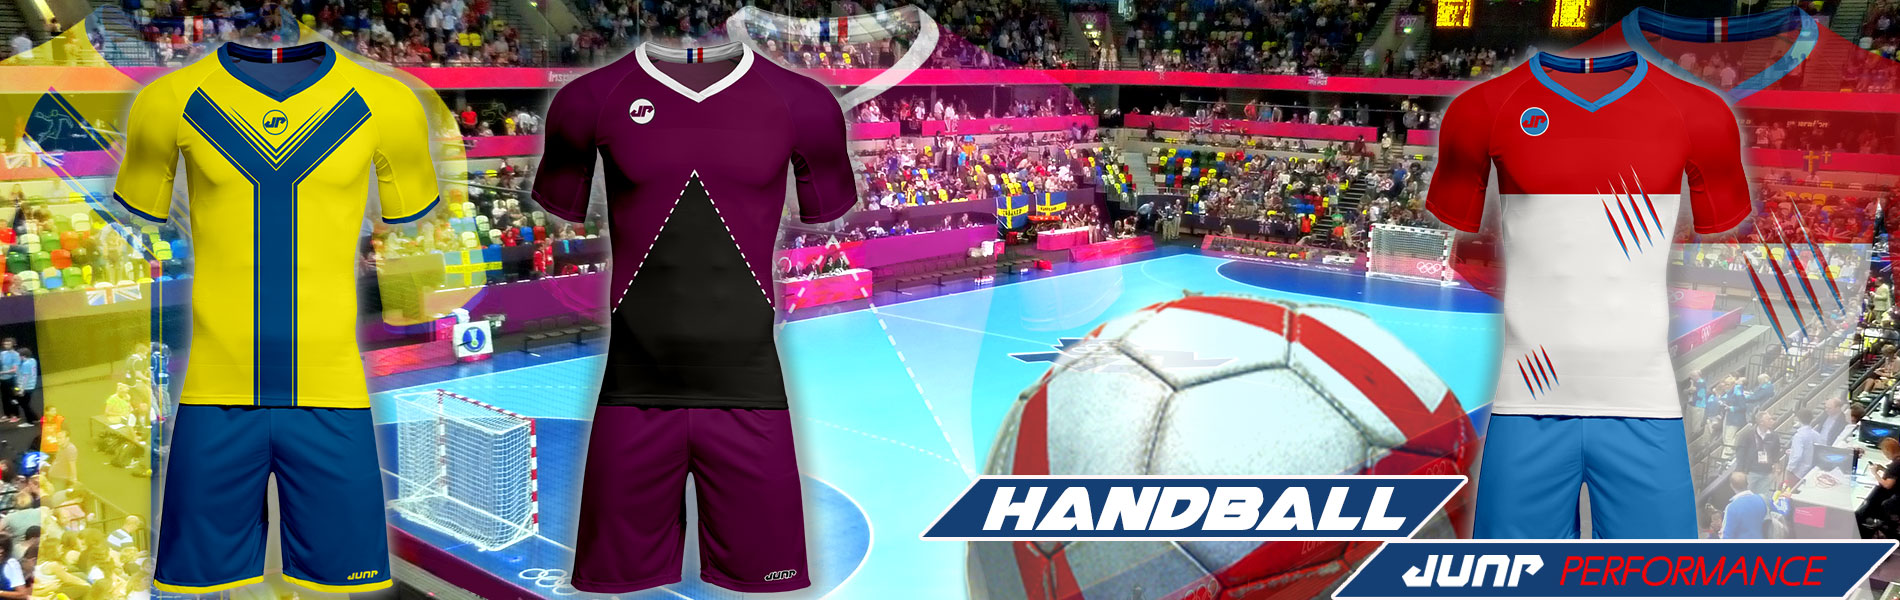 tenue maillot hand handball personnalise jump performance industries